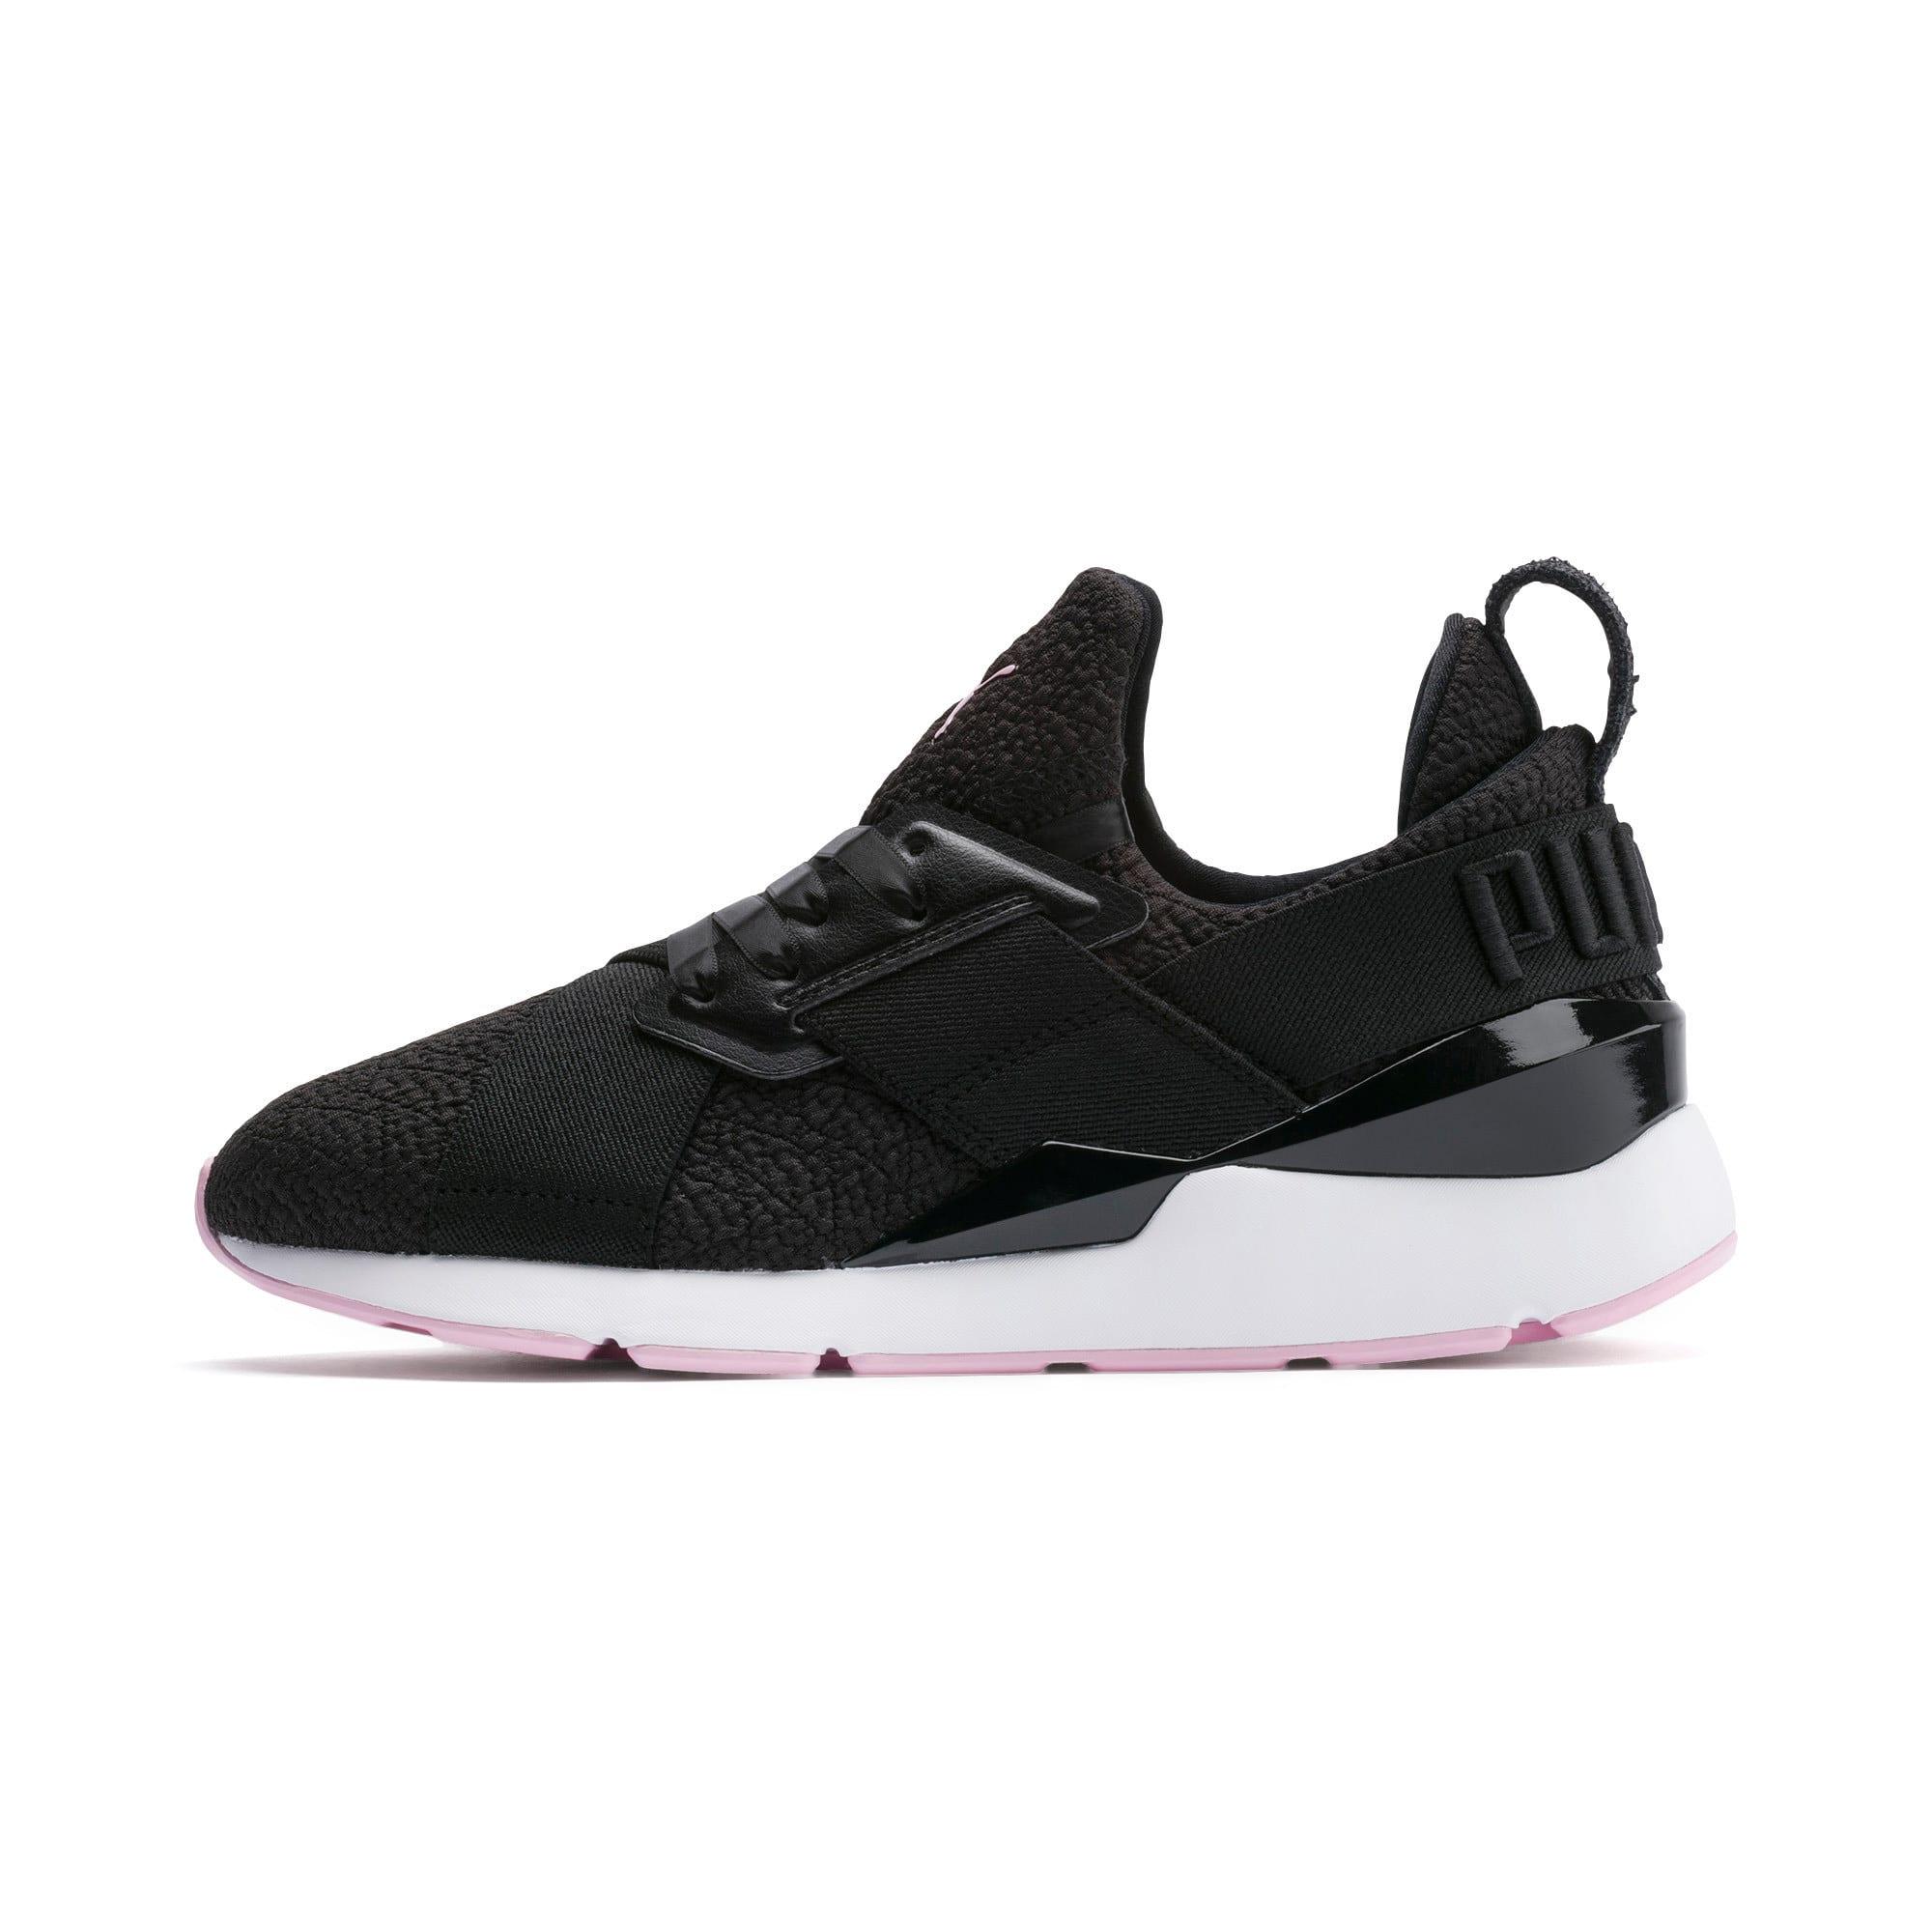 Thumbnail 1 of Muse TZ Damen Sneaker, Puma Black-Pale Pink, medium